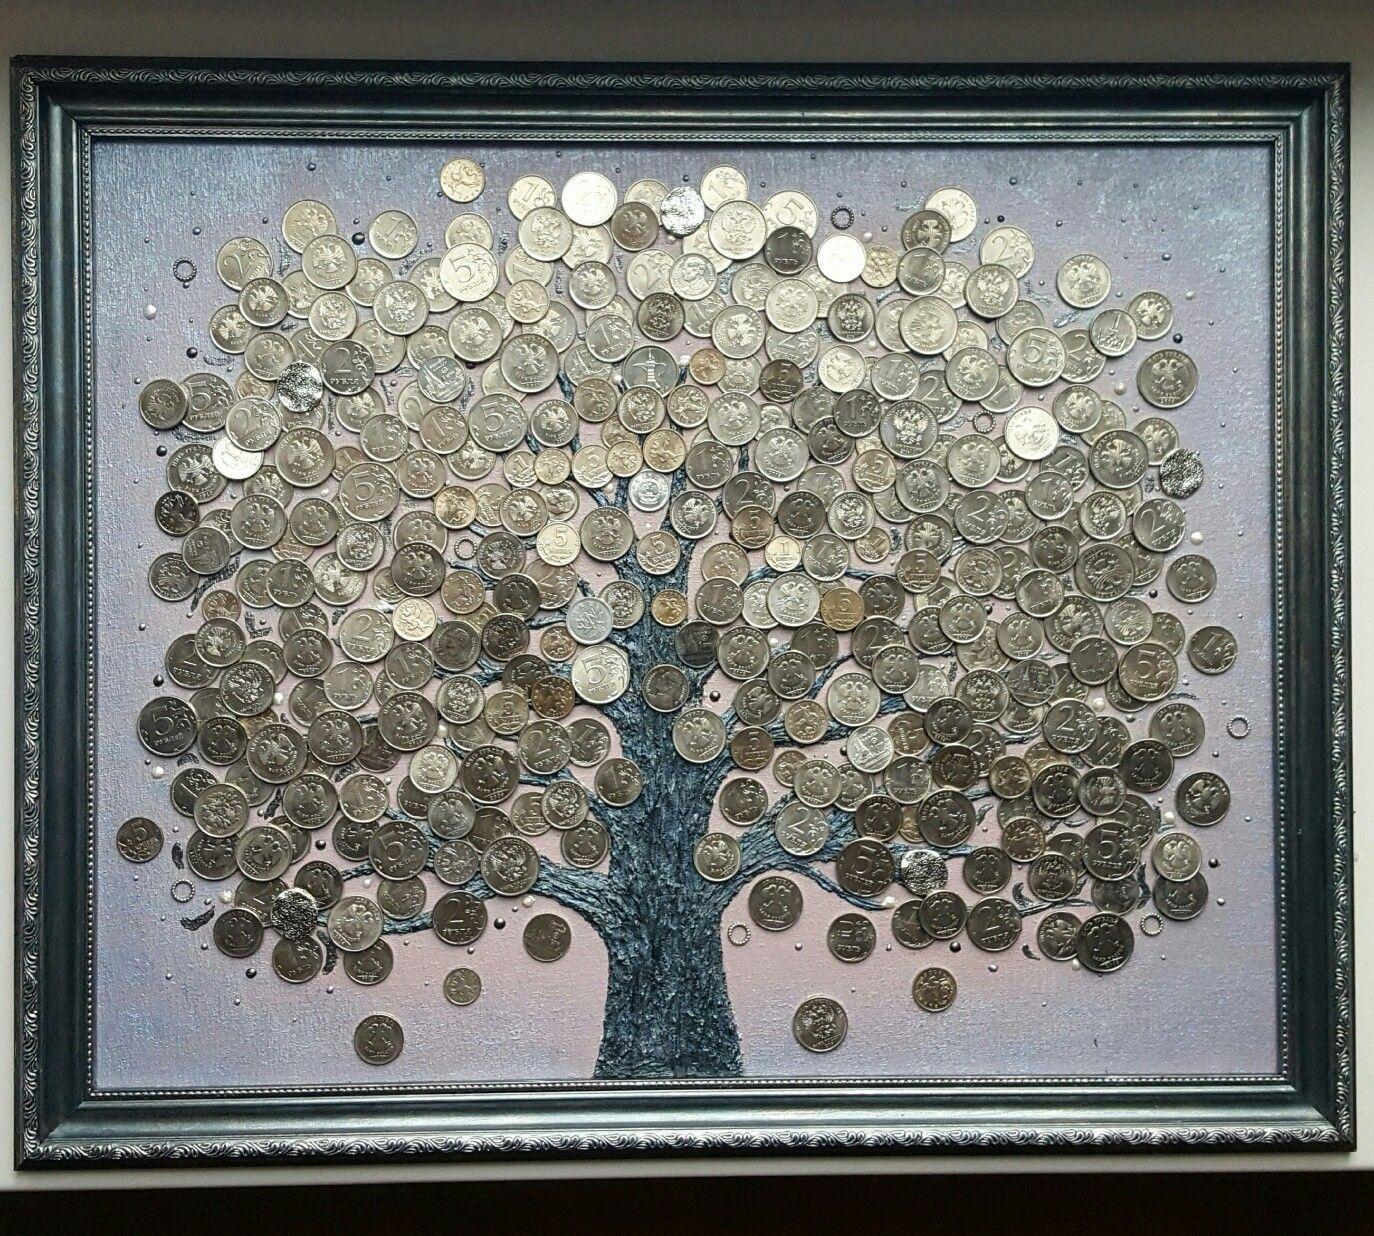 Картина своими руками для удачи и богатства